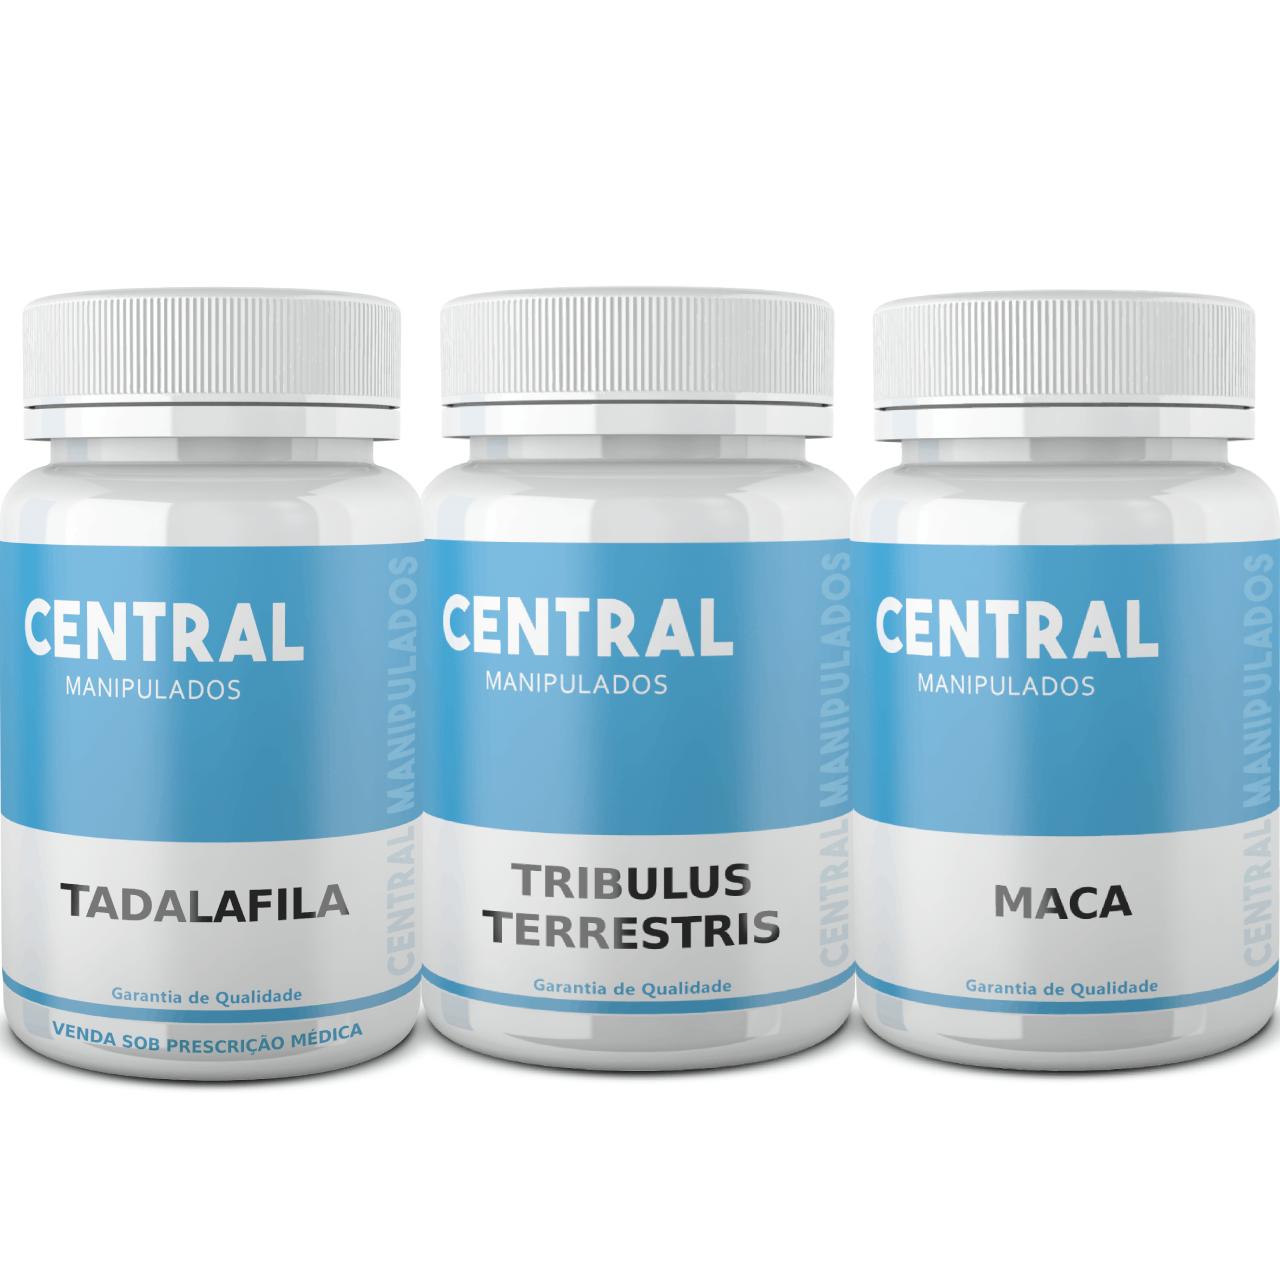 Tadalafila 5mg 60 cáps. + Tribullus Terrestris 500mg 60 cáps. + Maca Peruana 500mg 60 cáps. - Total 180 cápsulas